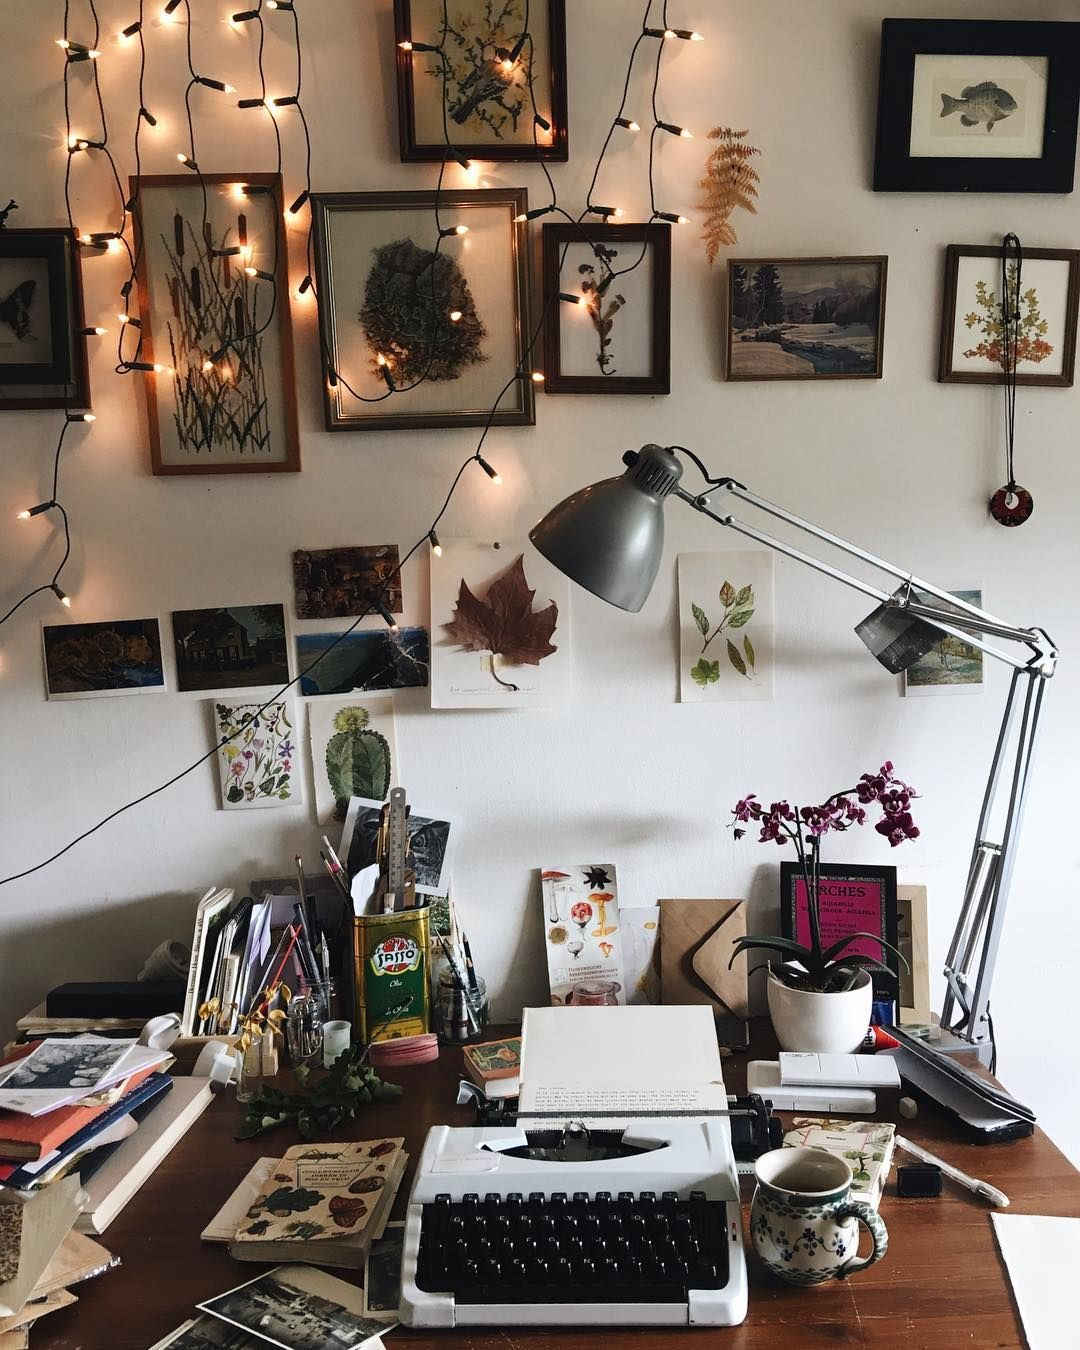 Pinterest » @nyauyehara | Aesthetic room decor, Diy ...